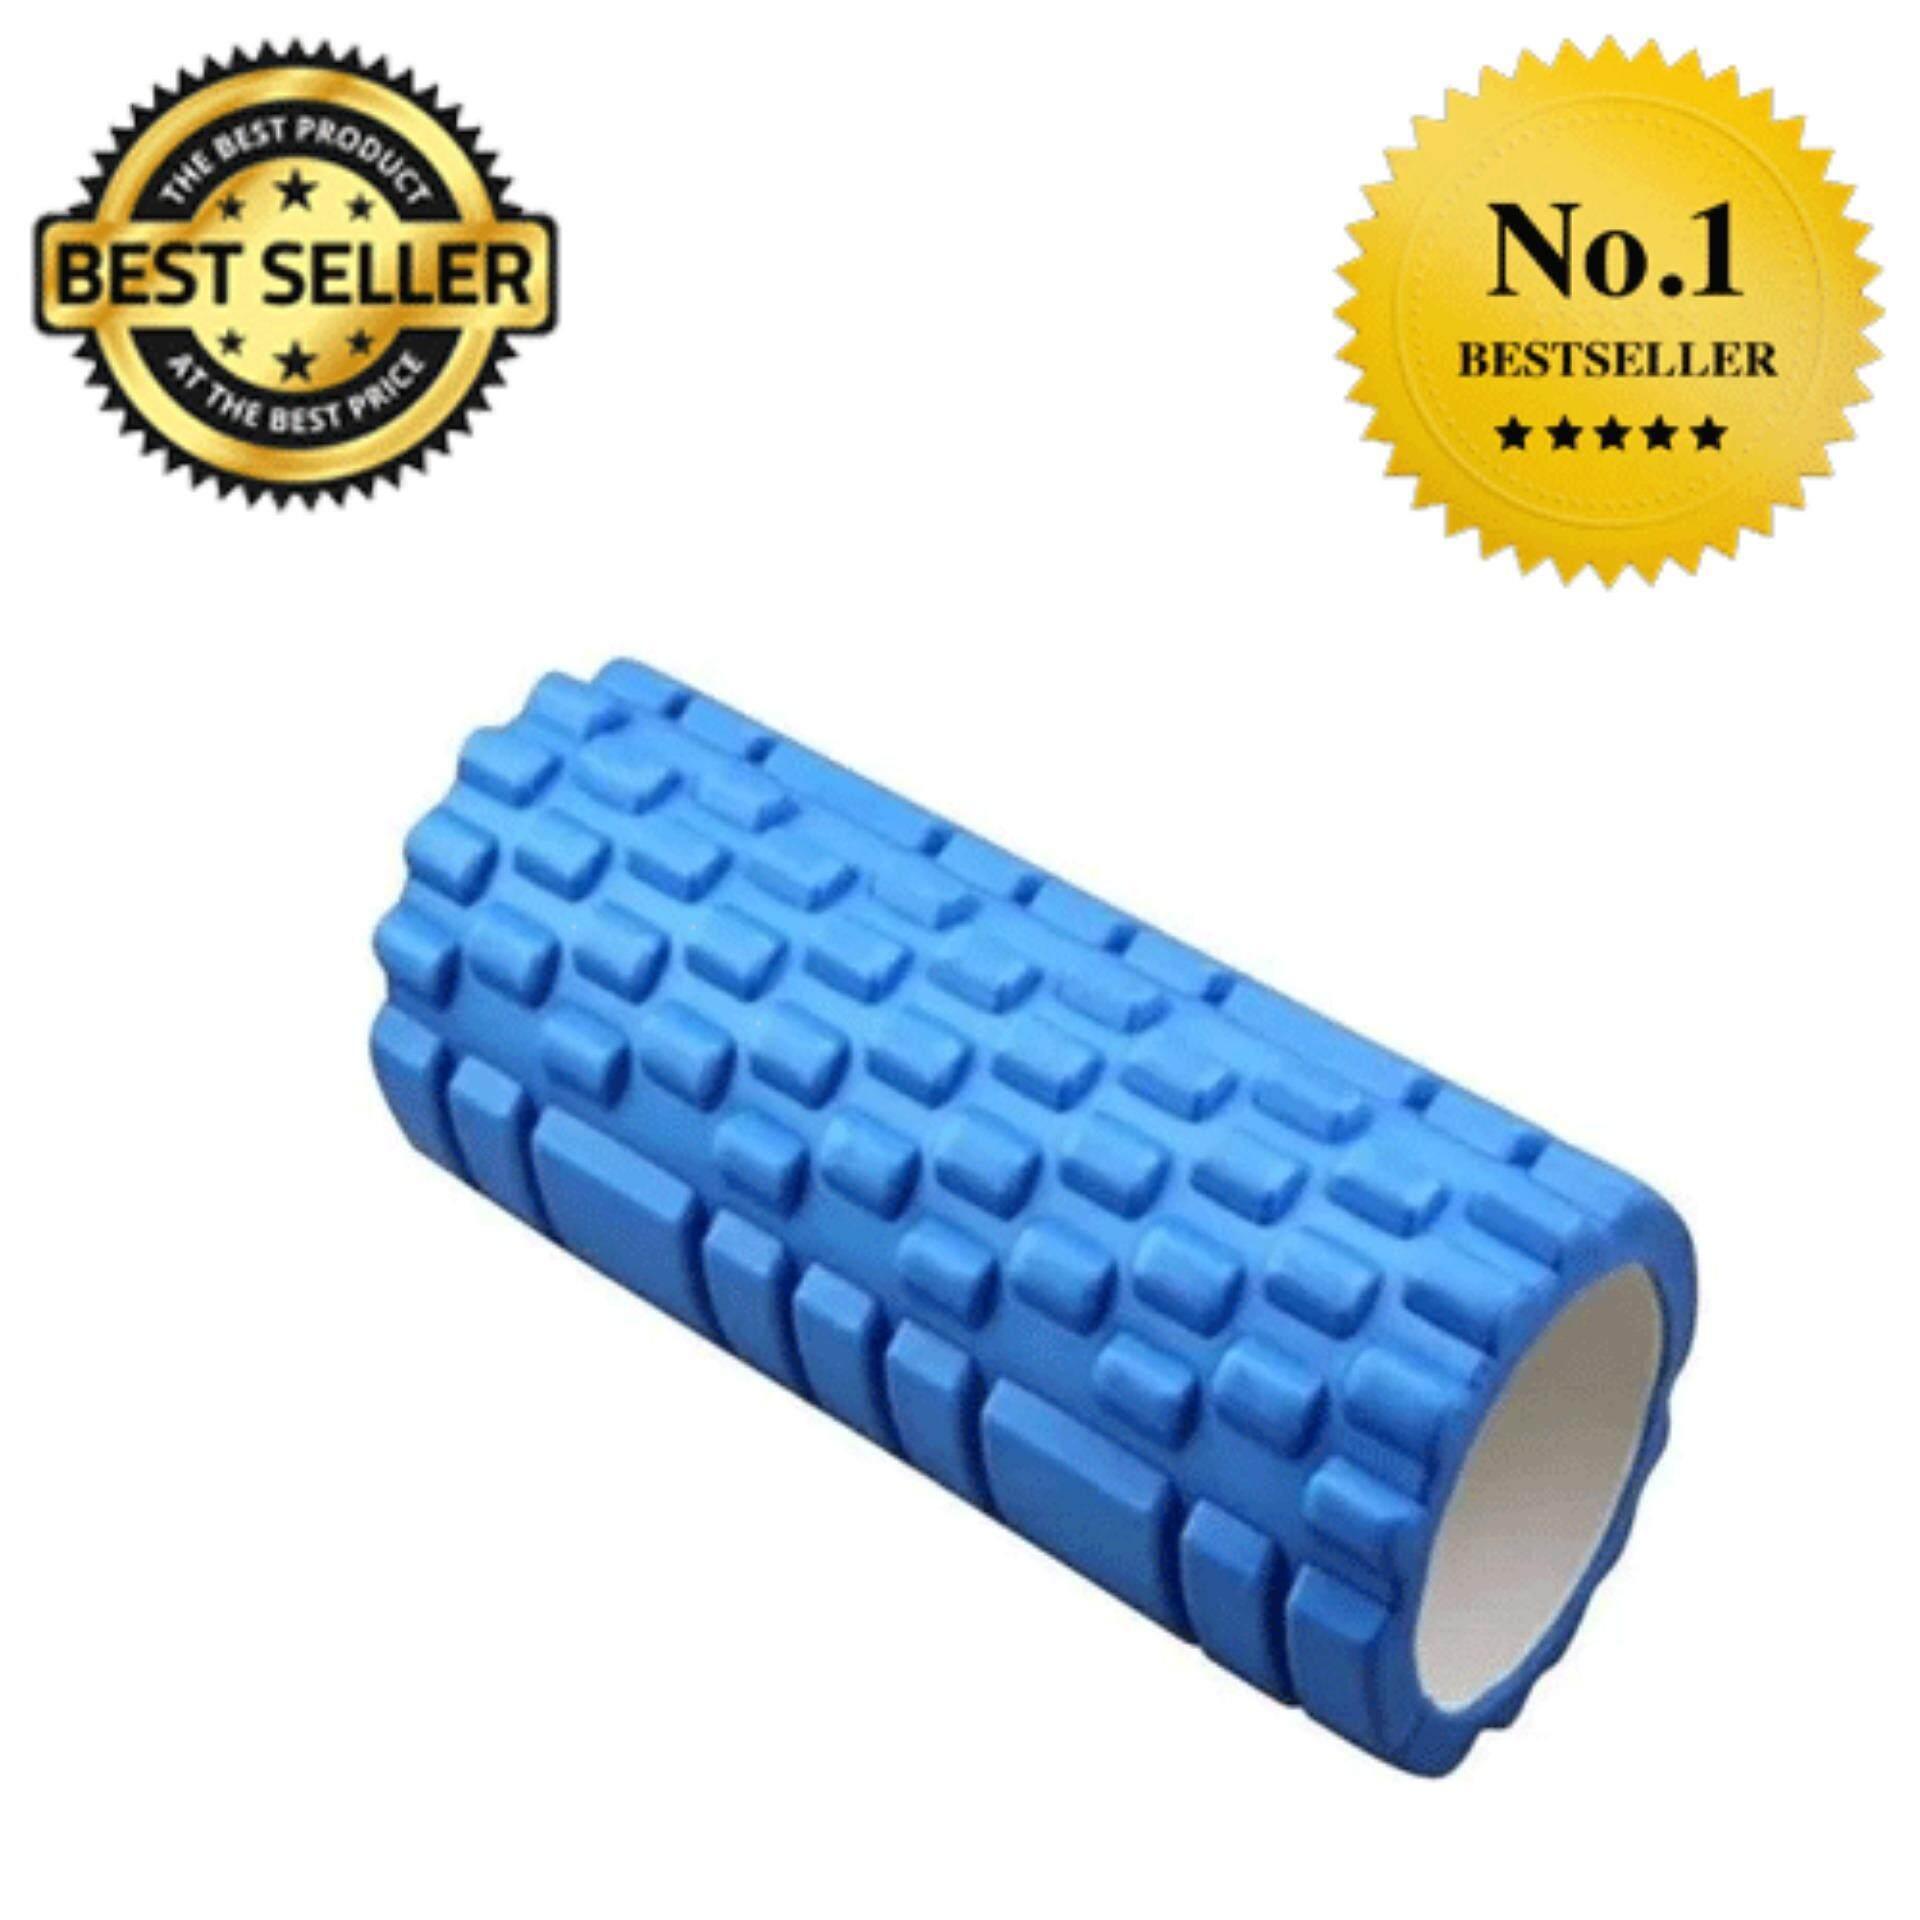 Sport City โฟมลูกกลิ้งโยคะ Yoga Foam Roller Massage รุ่น Hj B121 สีน้ำเงิน Sport City ถูก ใน กรุงเทพมหานคร